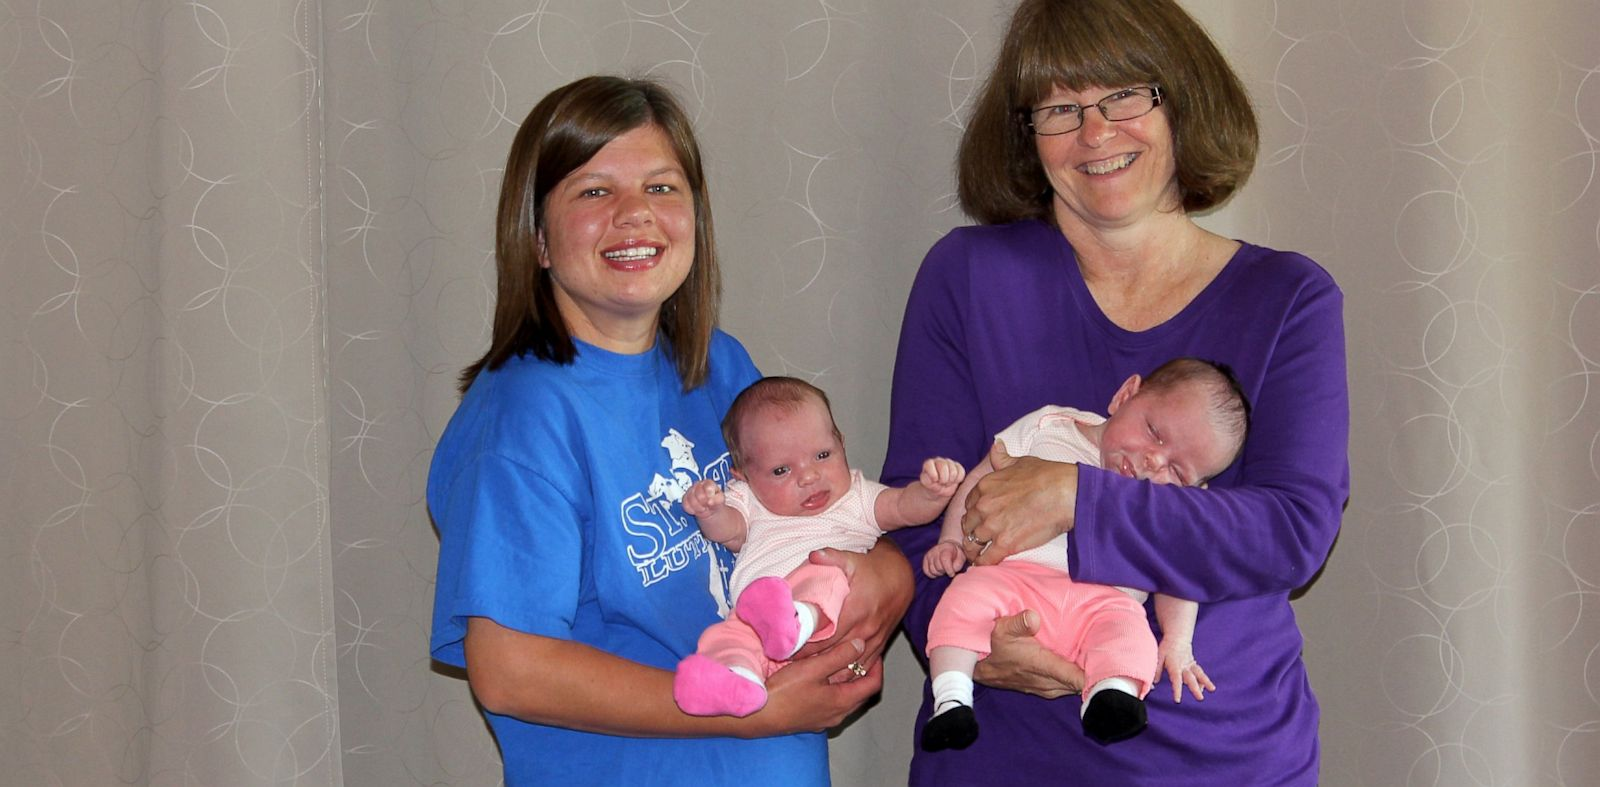 PHOTO: Grandma Gives Birth To Granddaughters